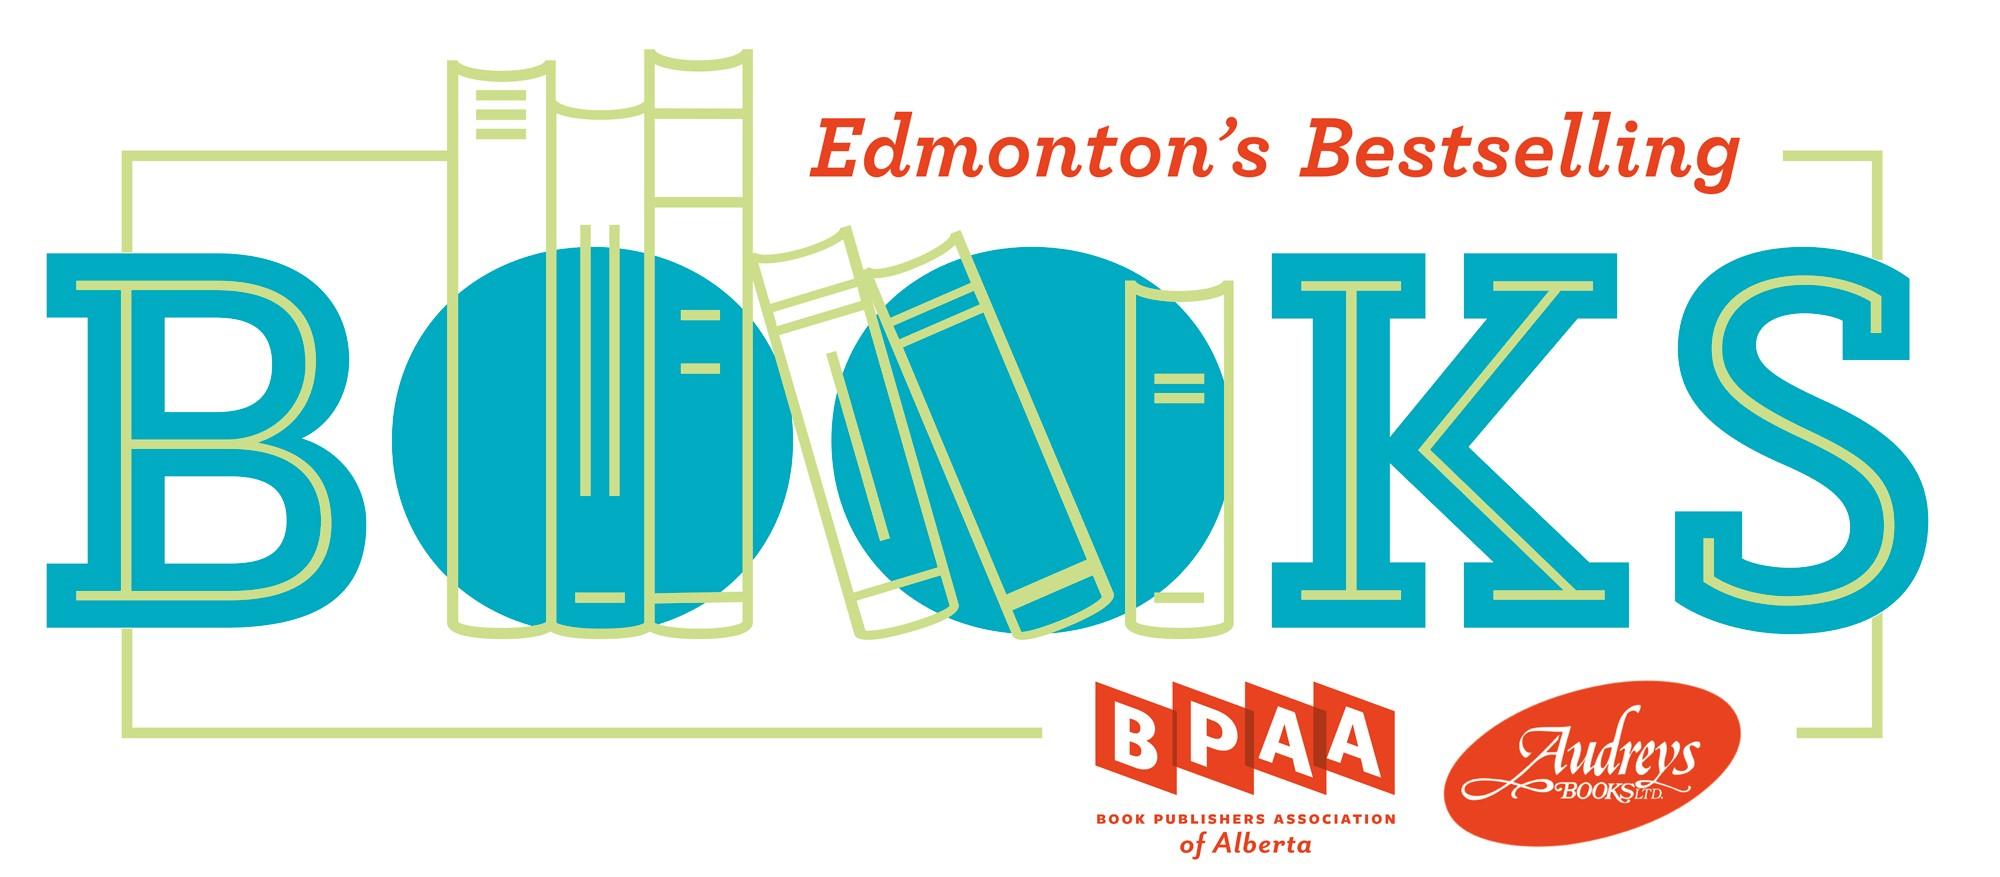 Edmonton Best Seller List for May 21, 2017 | Edmonton